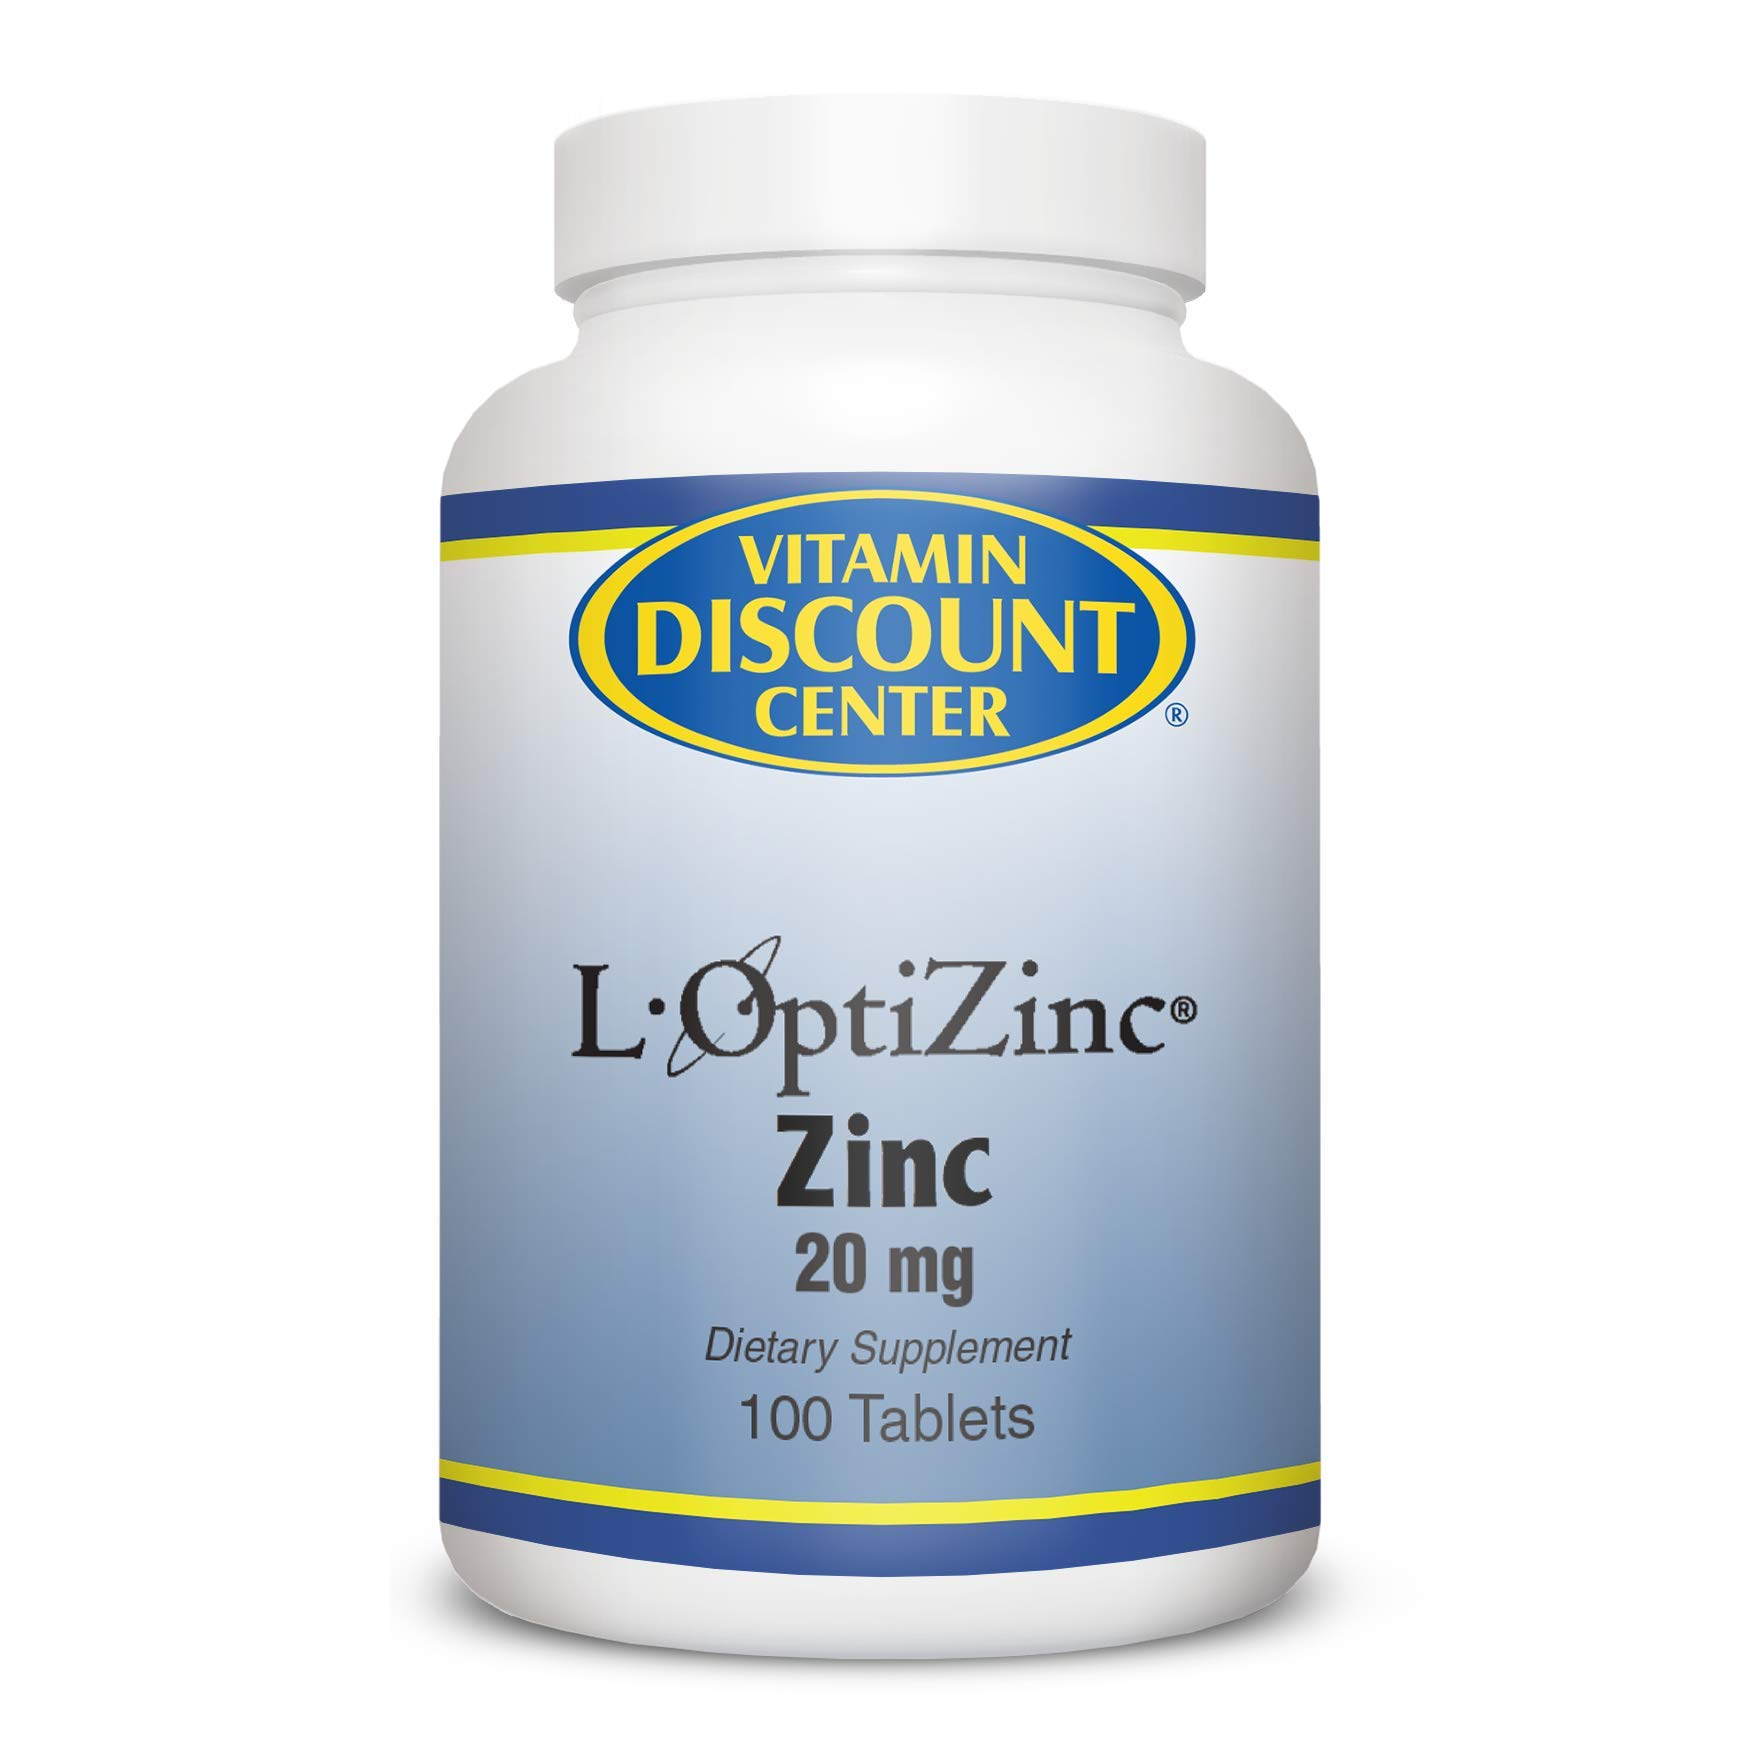 Vitamin Discount Center Zinc Supplement 20 mg, 100 Tablets